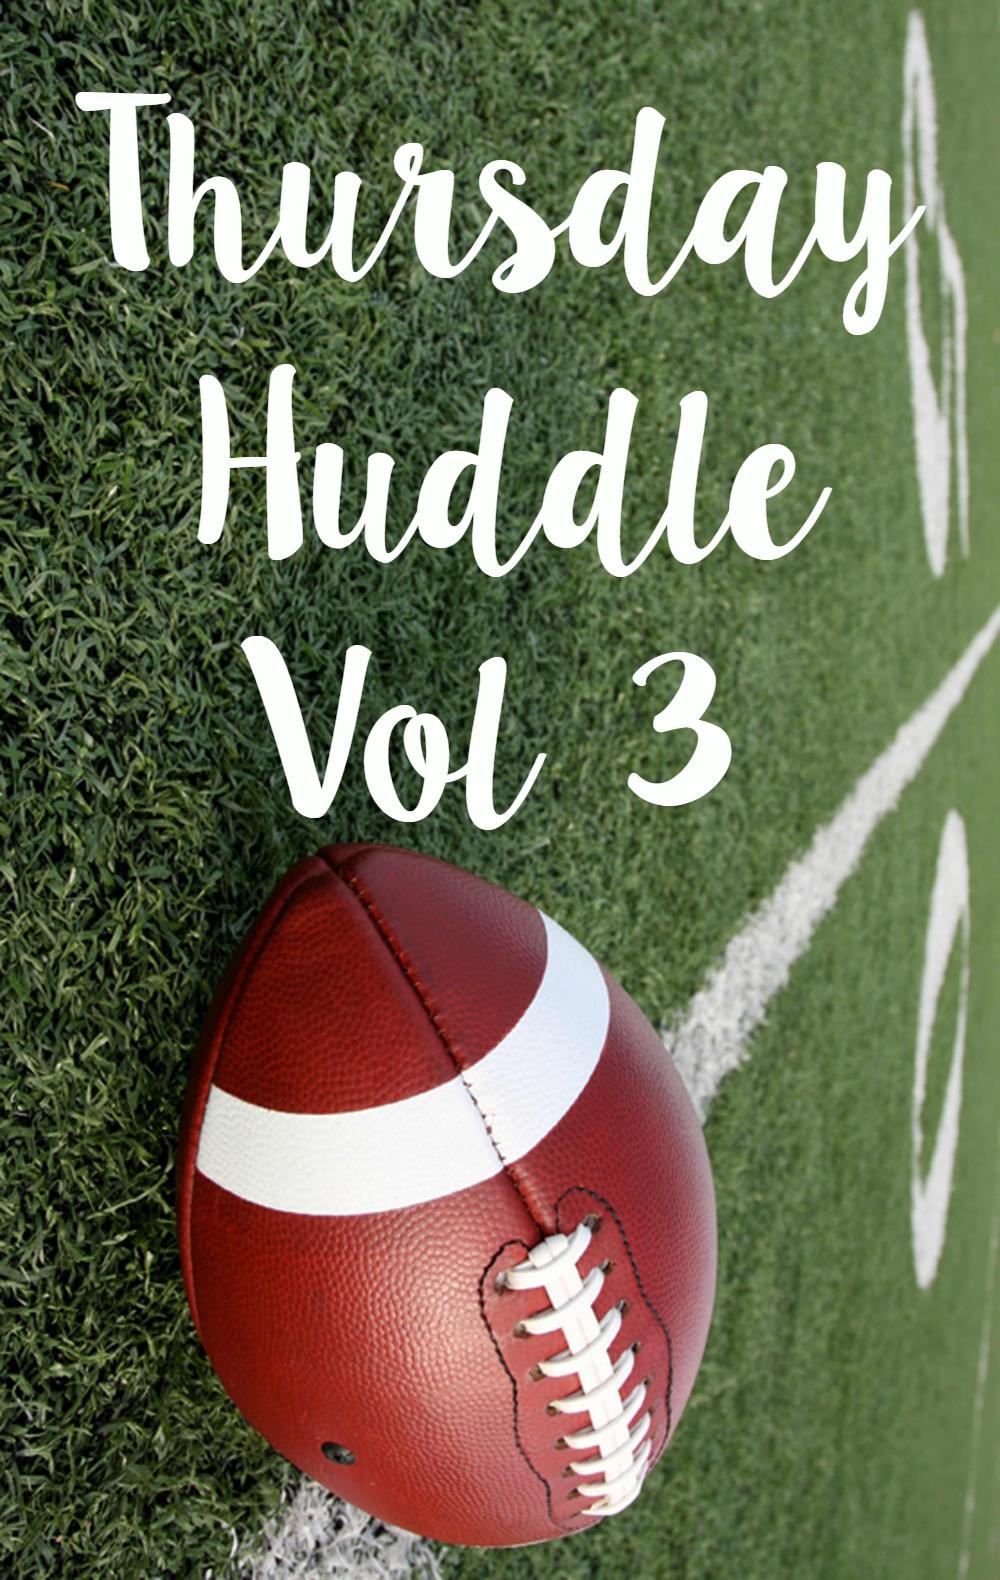 thursday-huddle-vol3